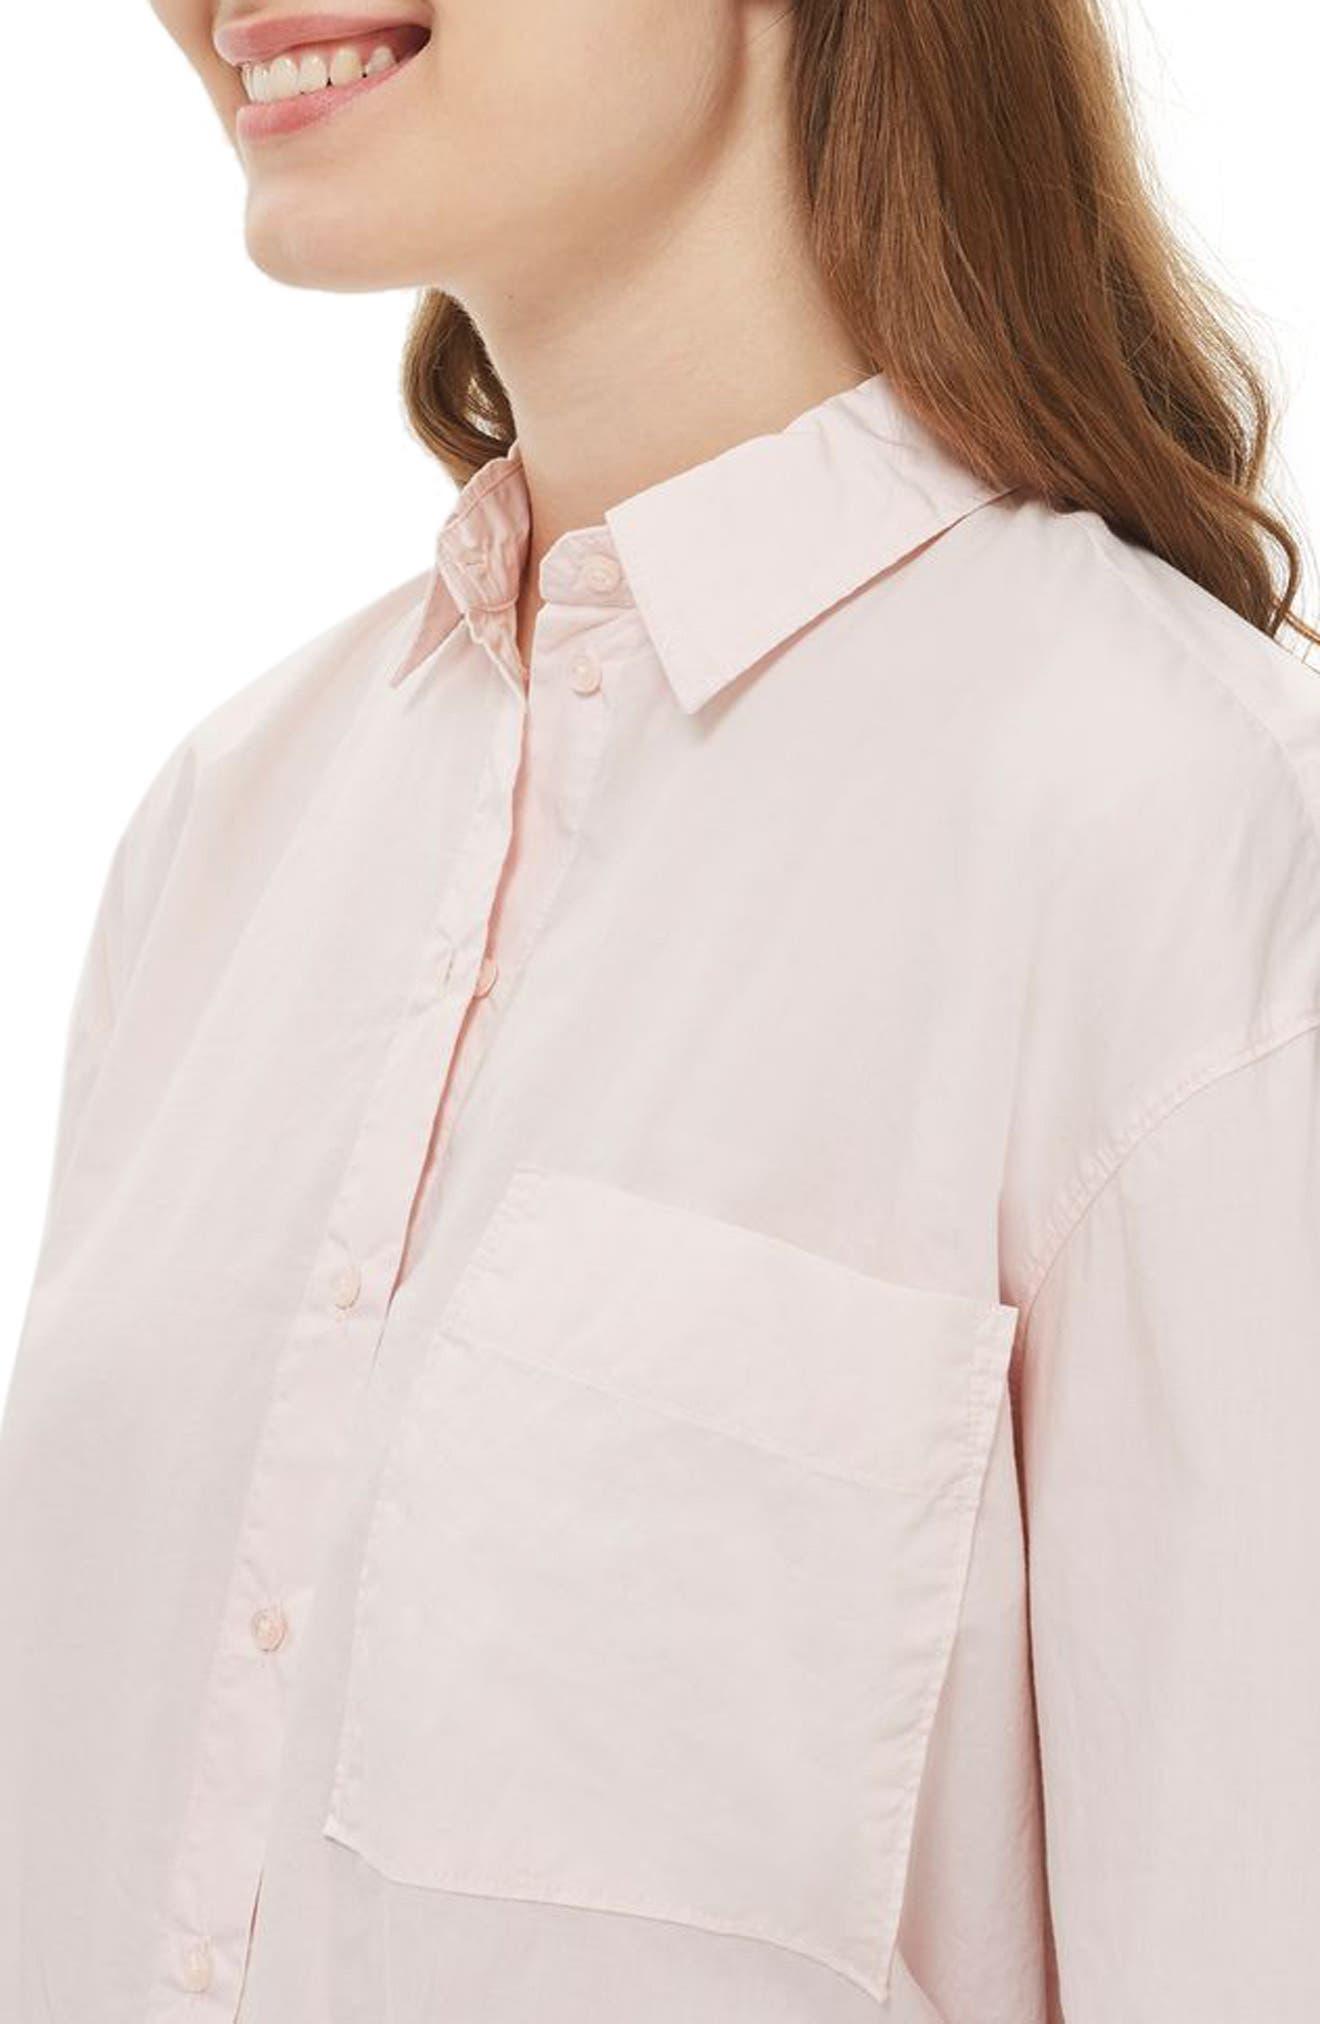 Olly Oversize Poplin Shirt,                             Alternate thumbnail 4, color,                             Light Pink